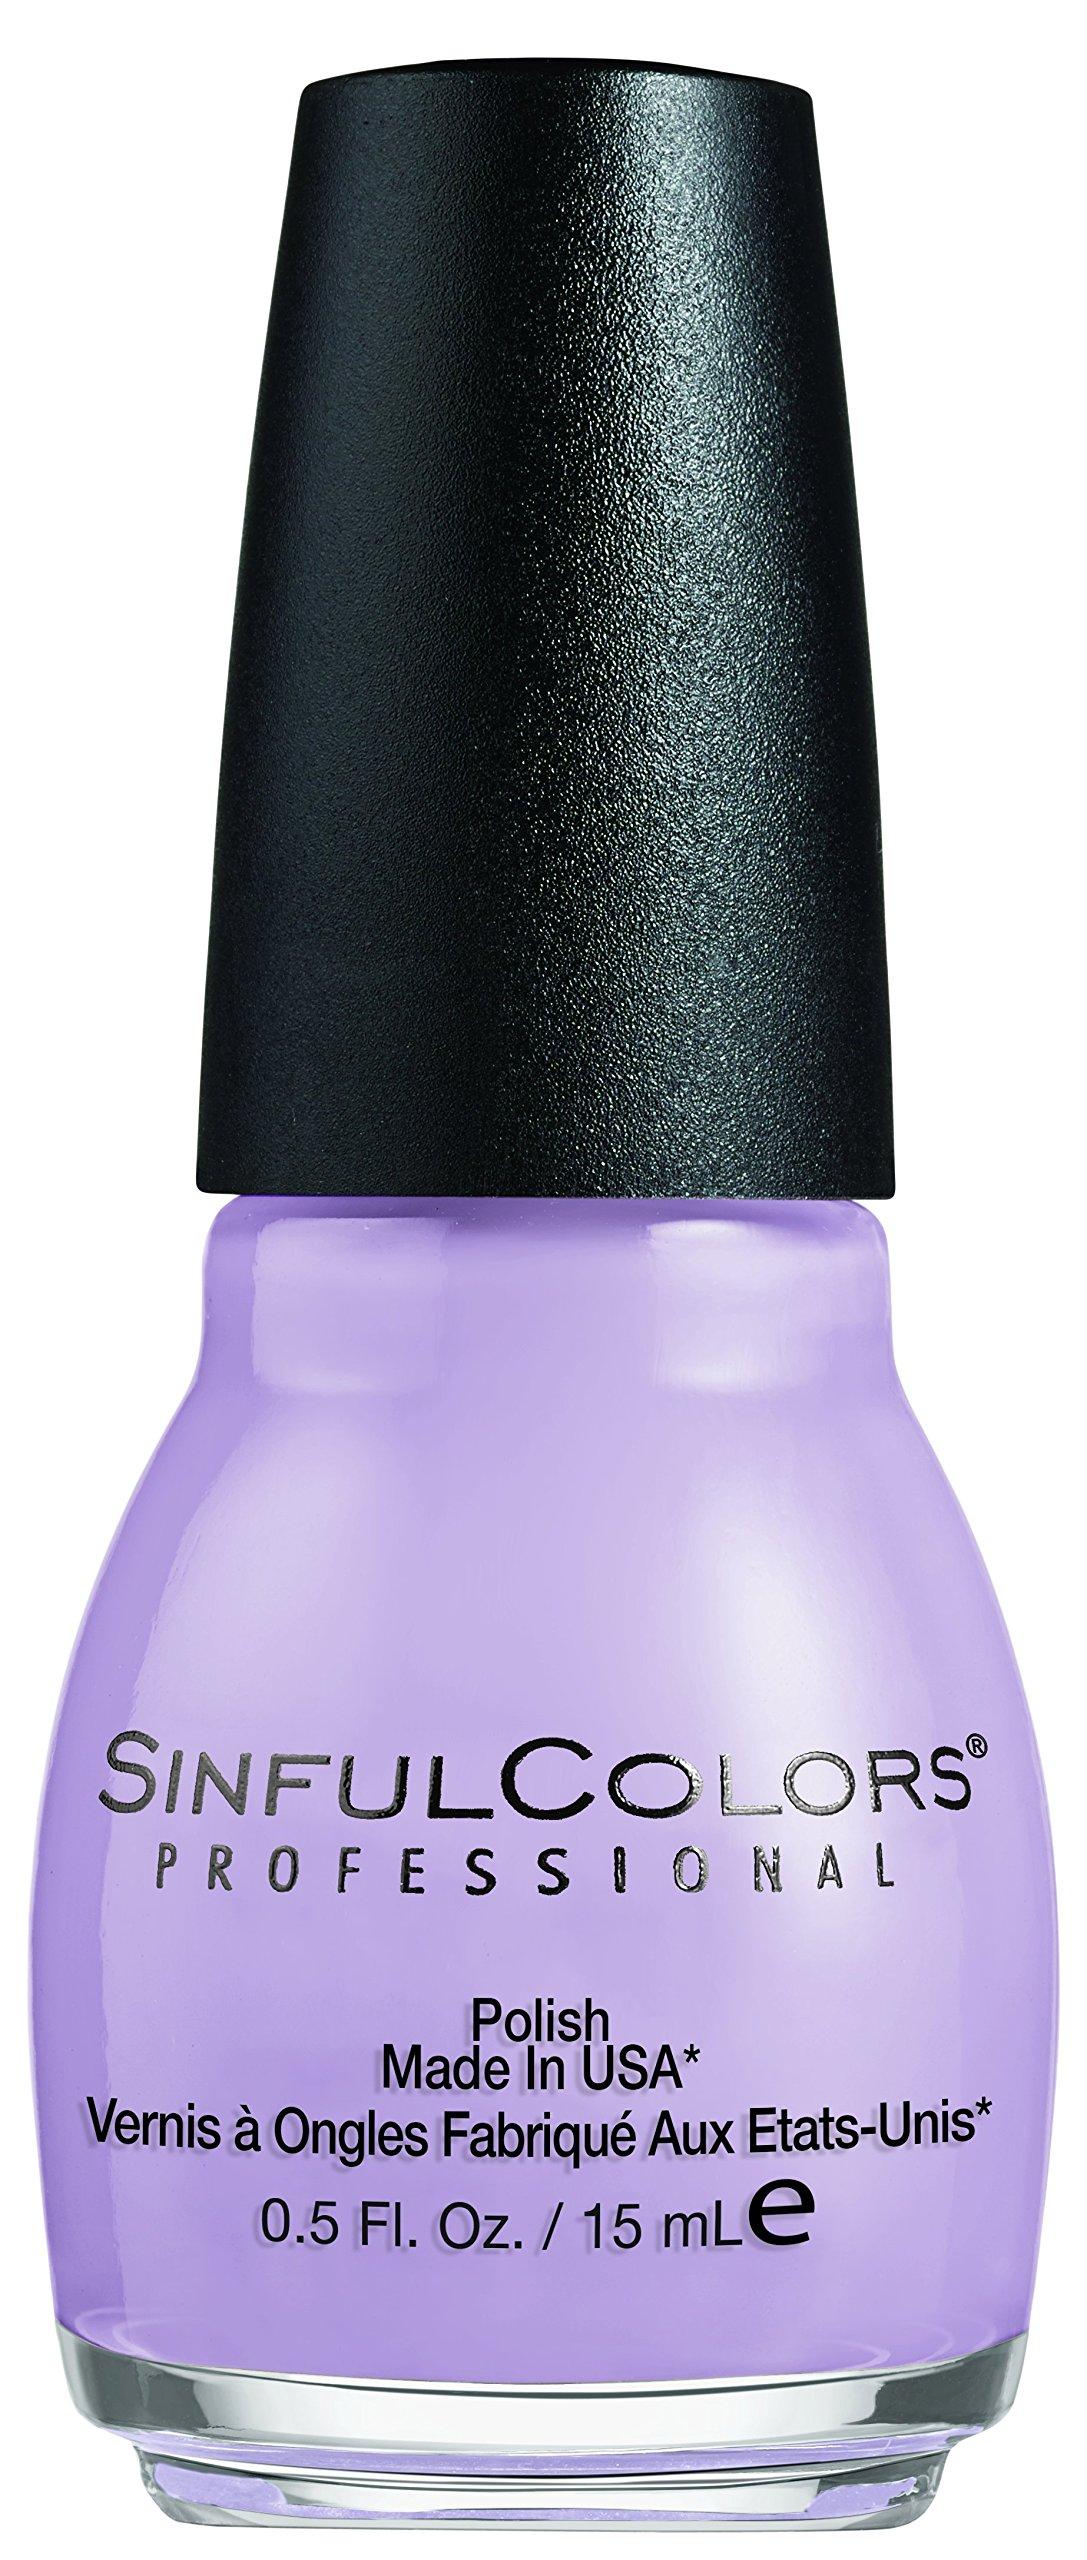 Sinful Colors - Nail Polish Lie-Lac